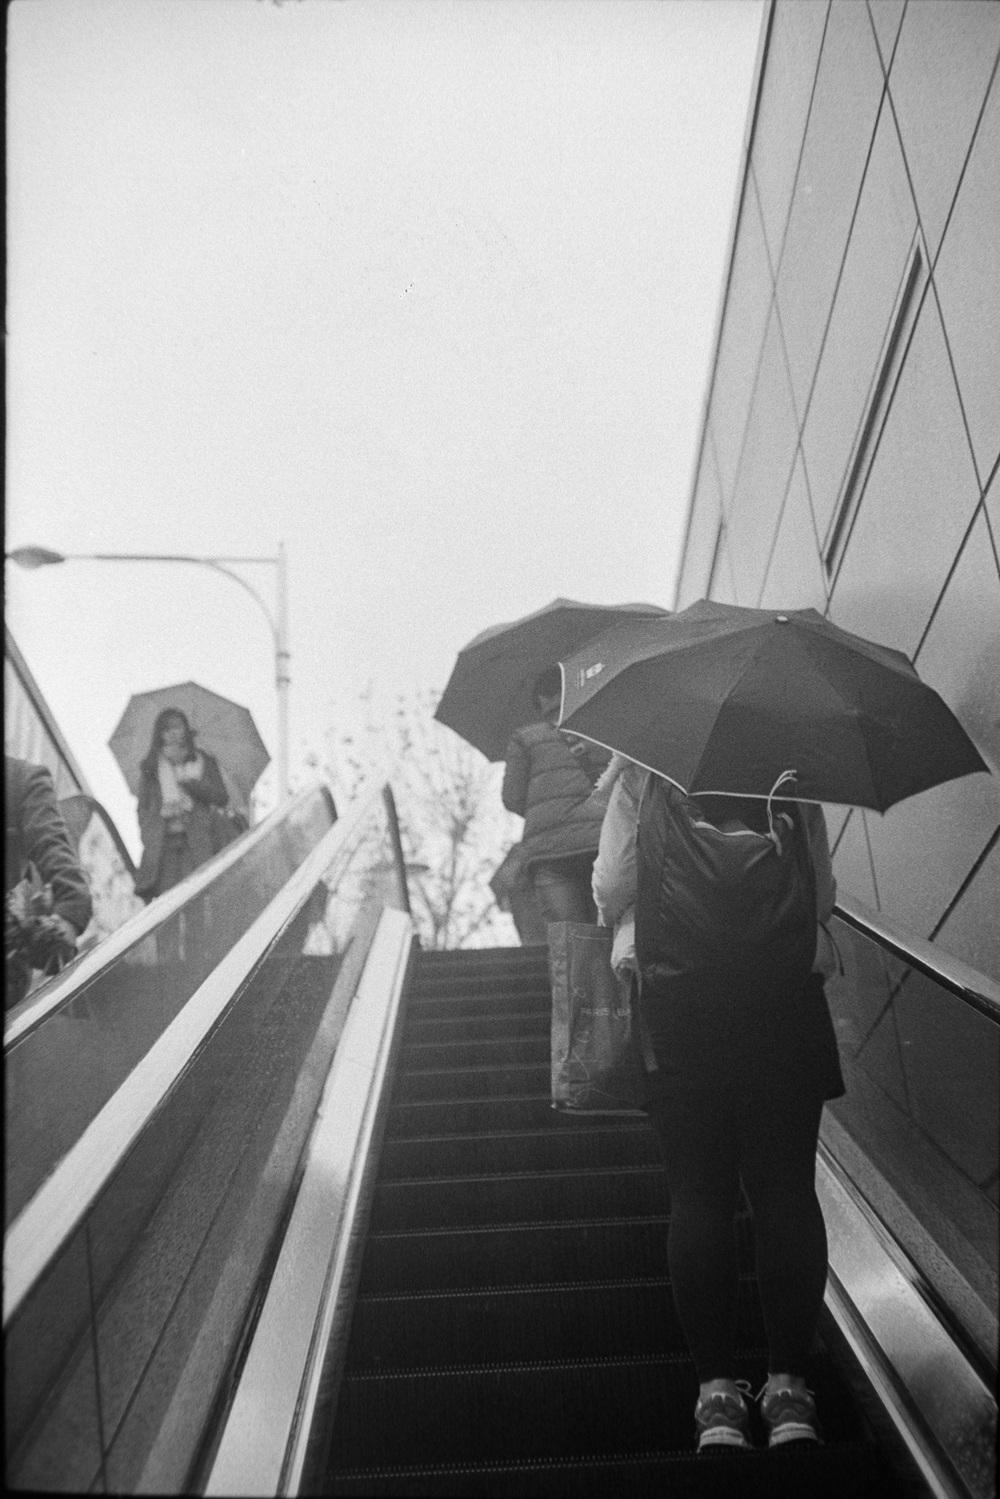 escalator umbrella.jpg